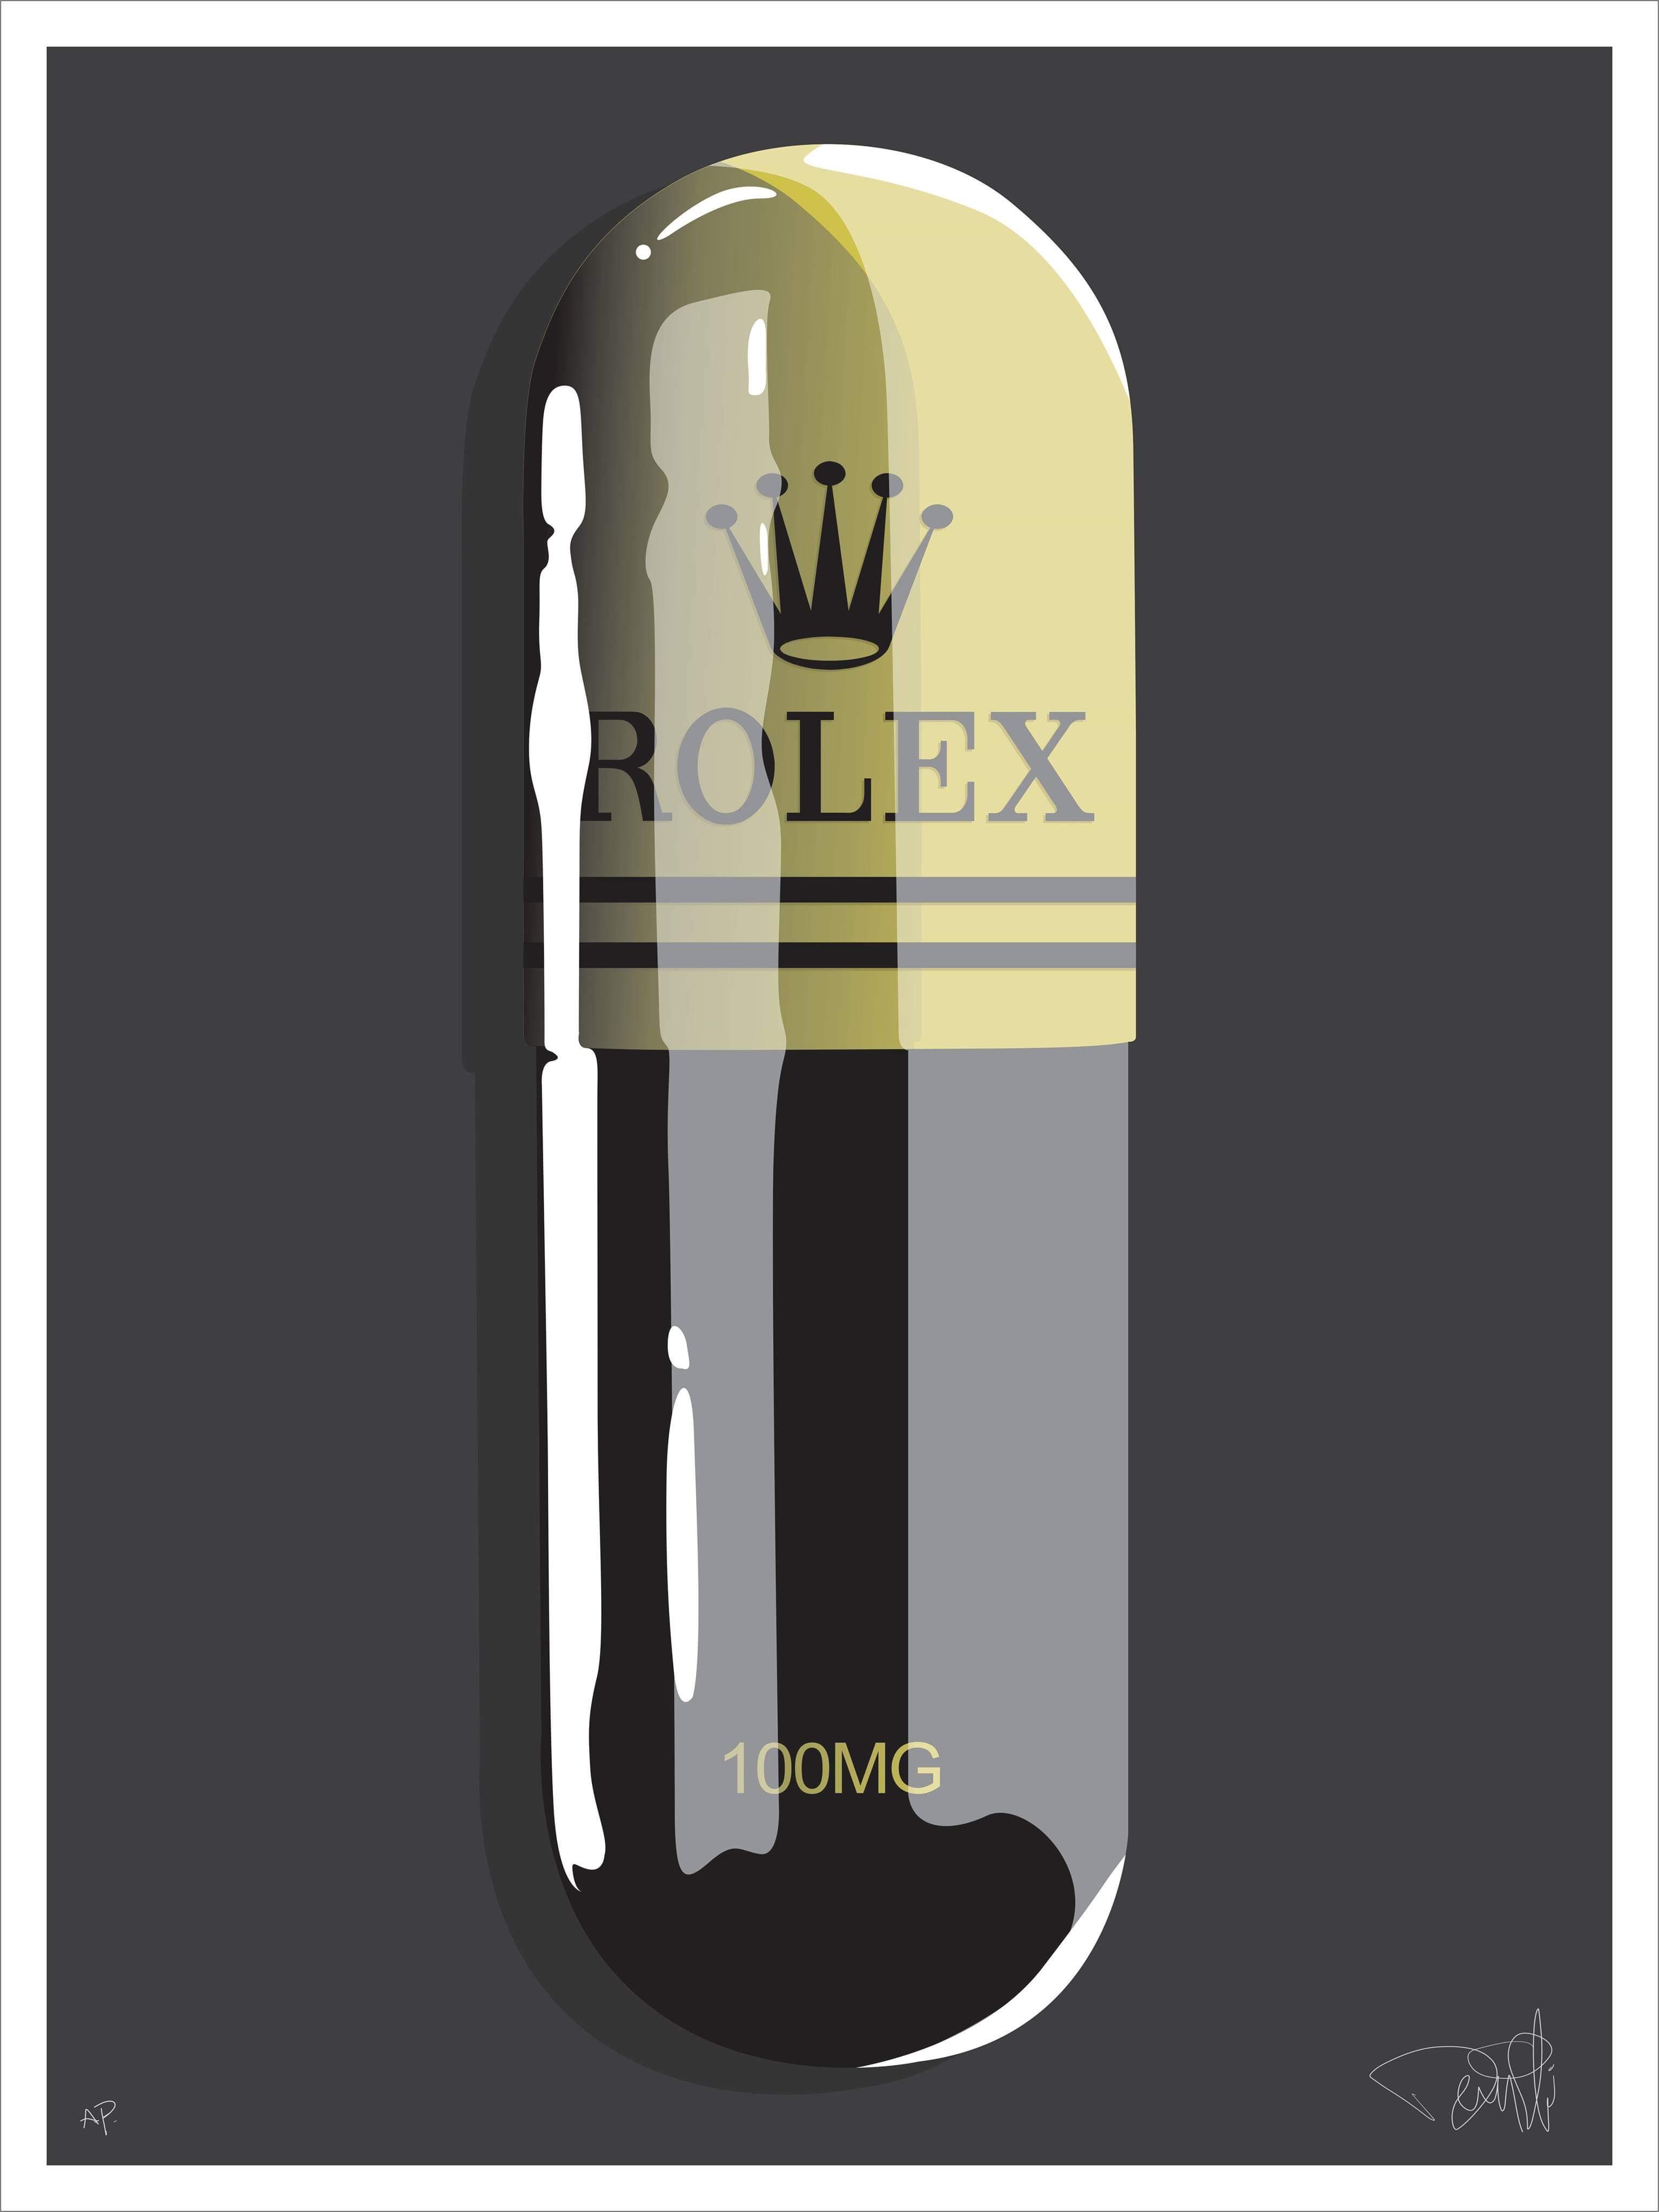 Rolex print